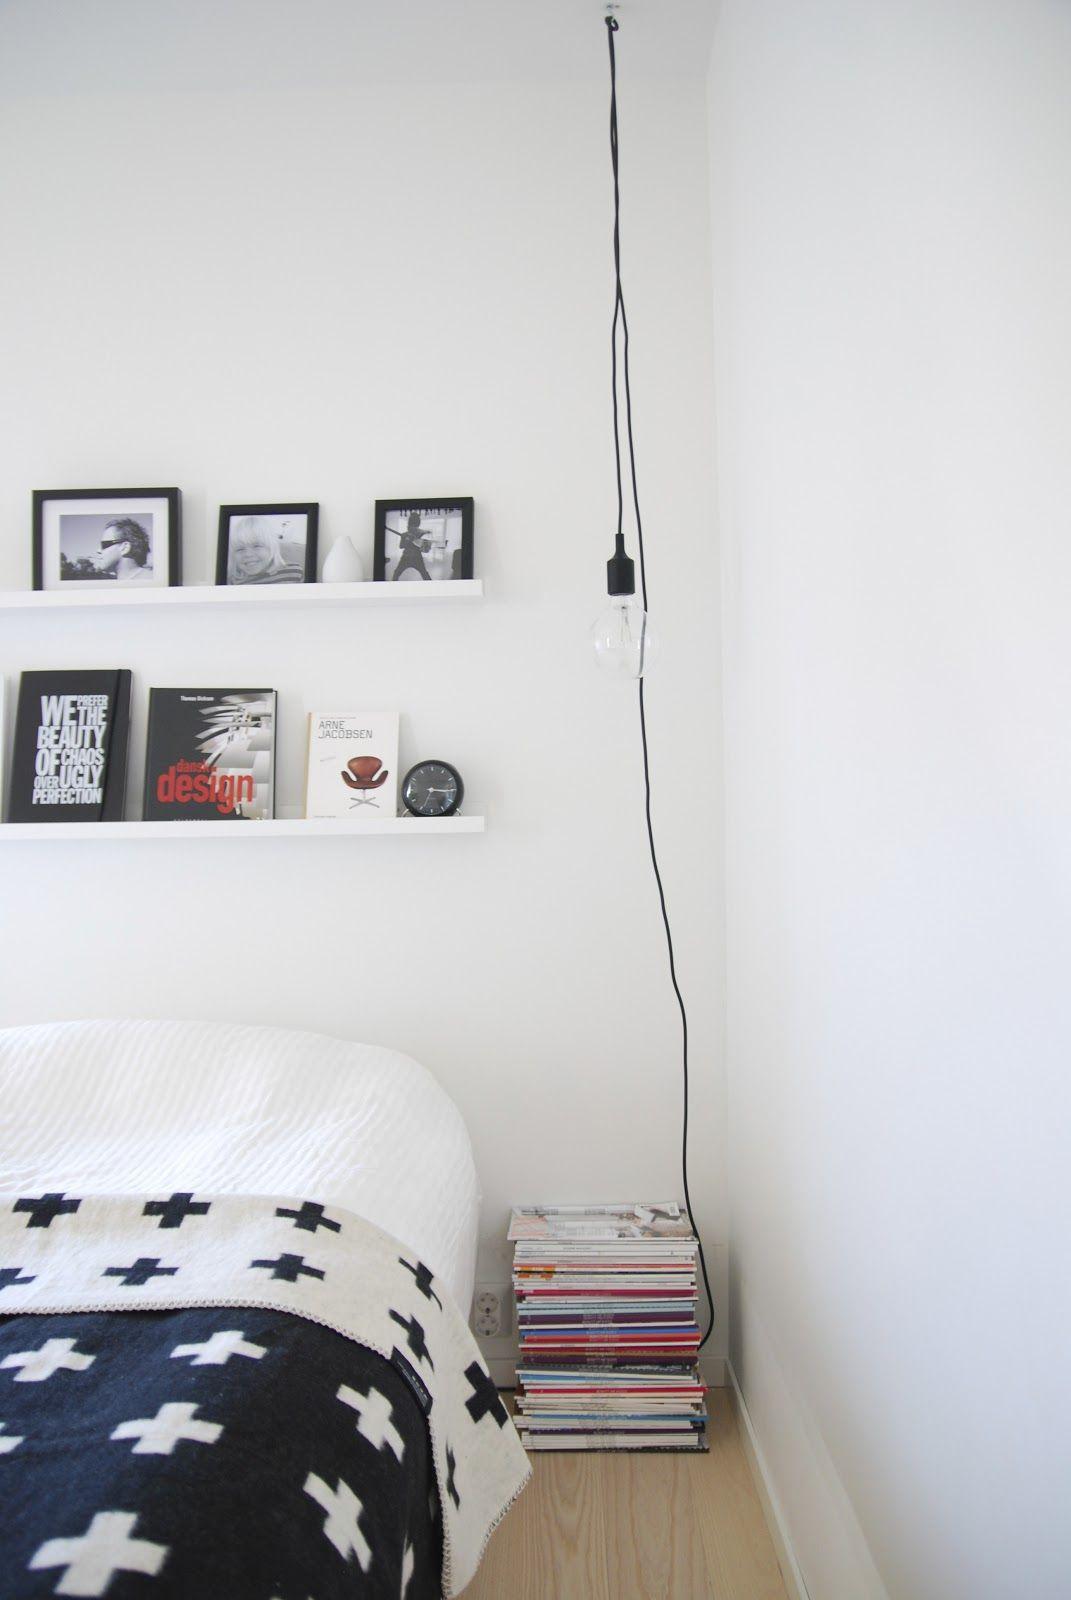 Via Fargebarn | Bedroom | Black and White | Pia Wallen Blanket